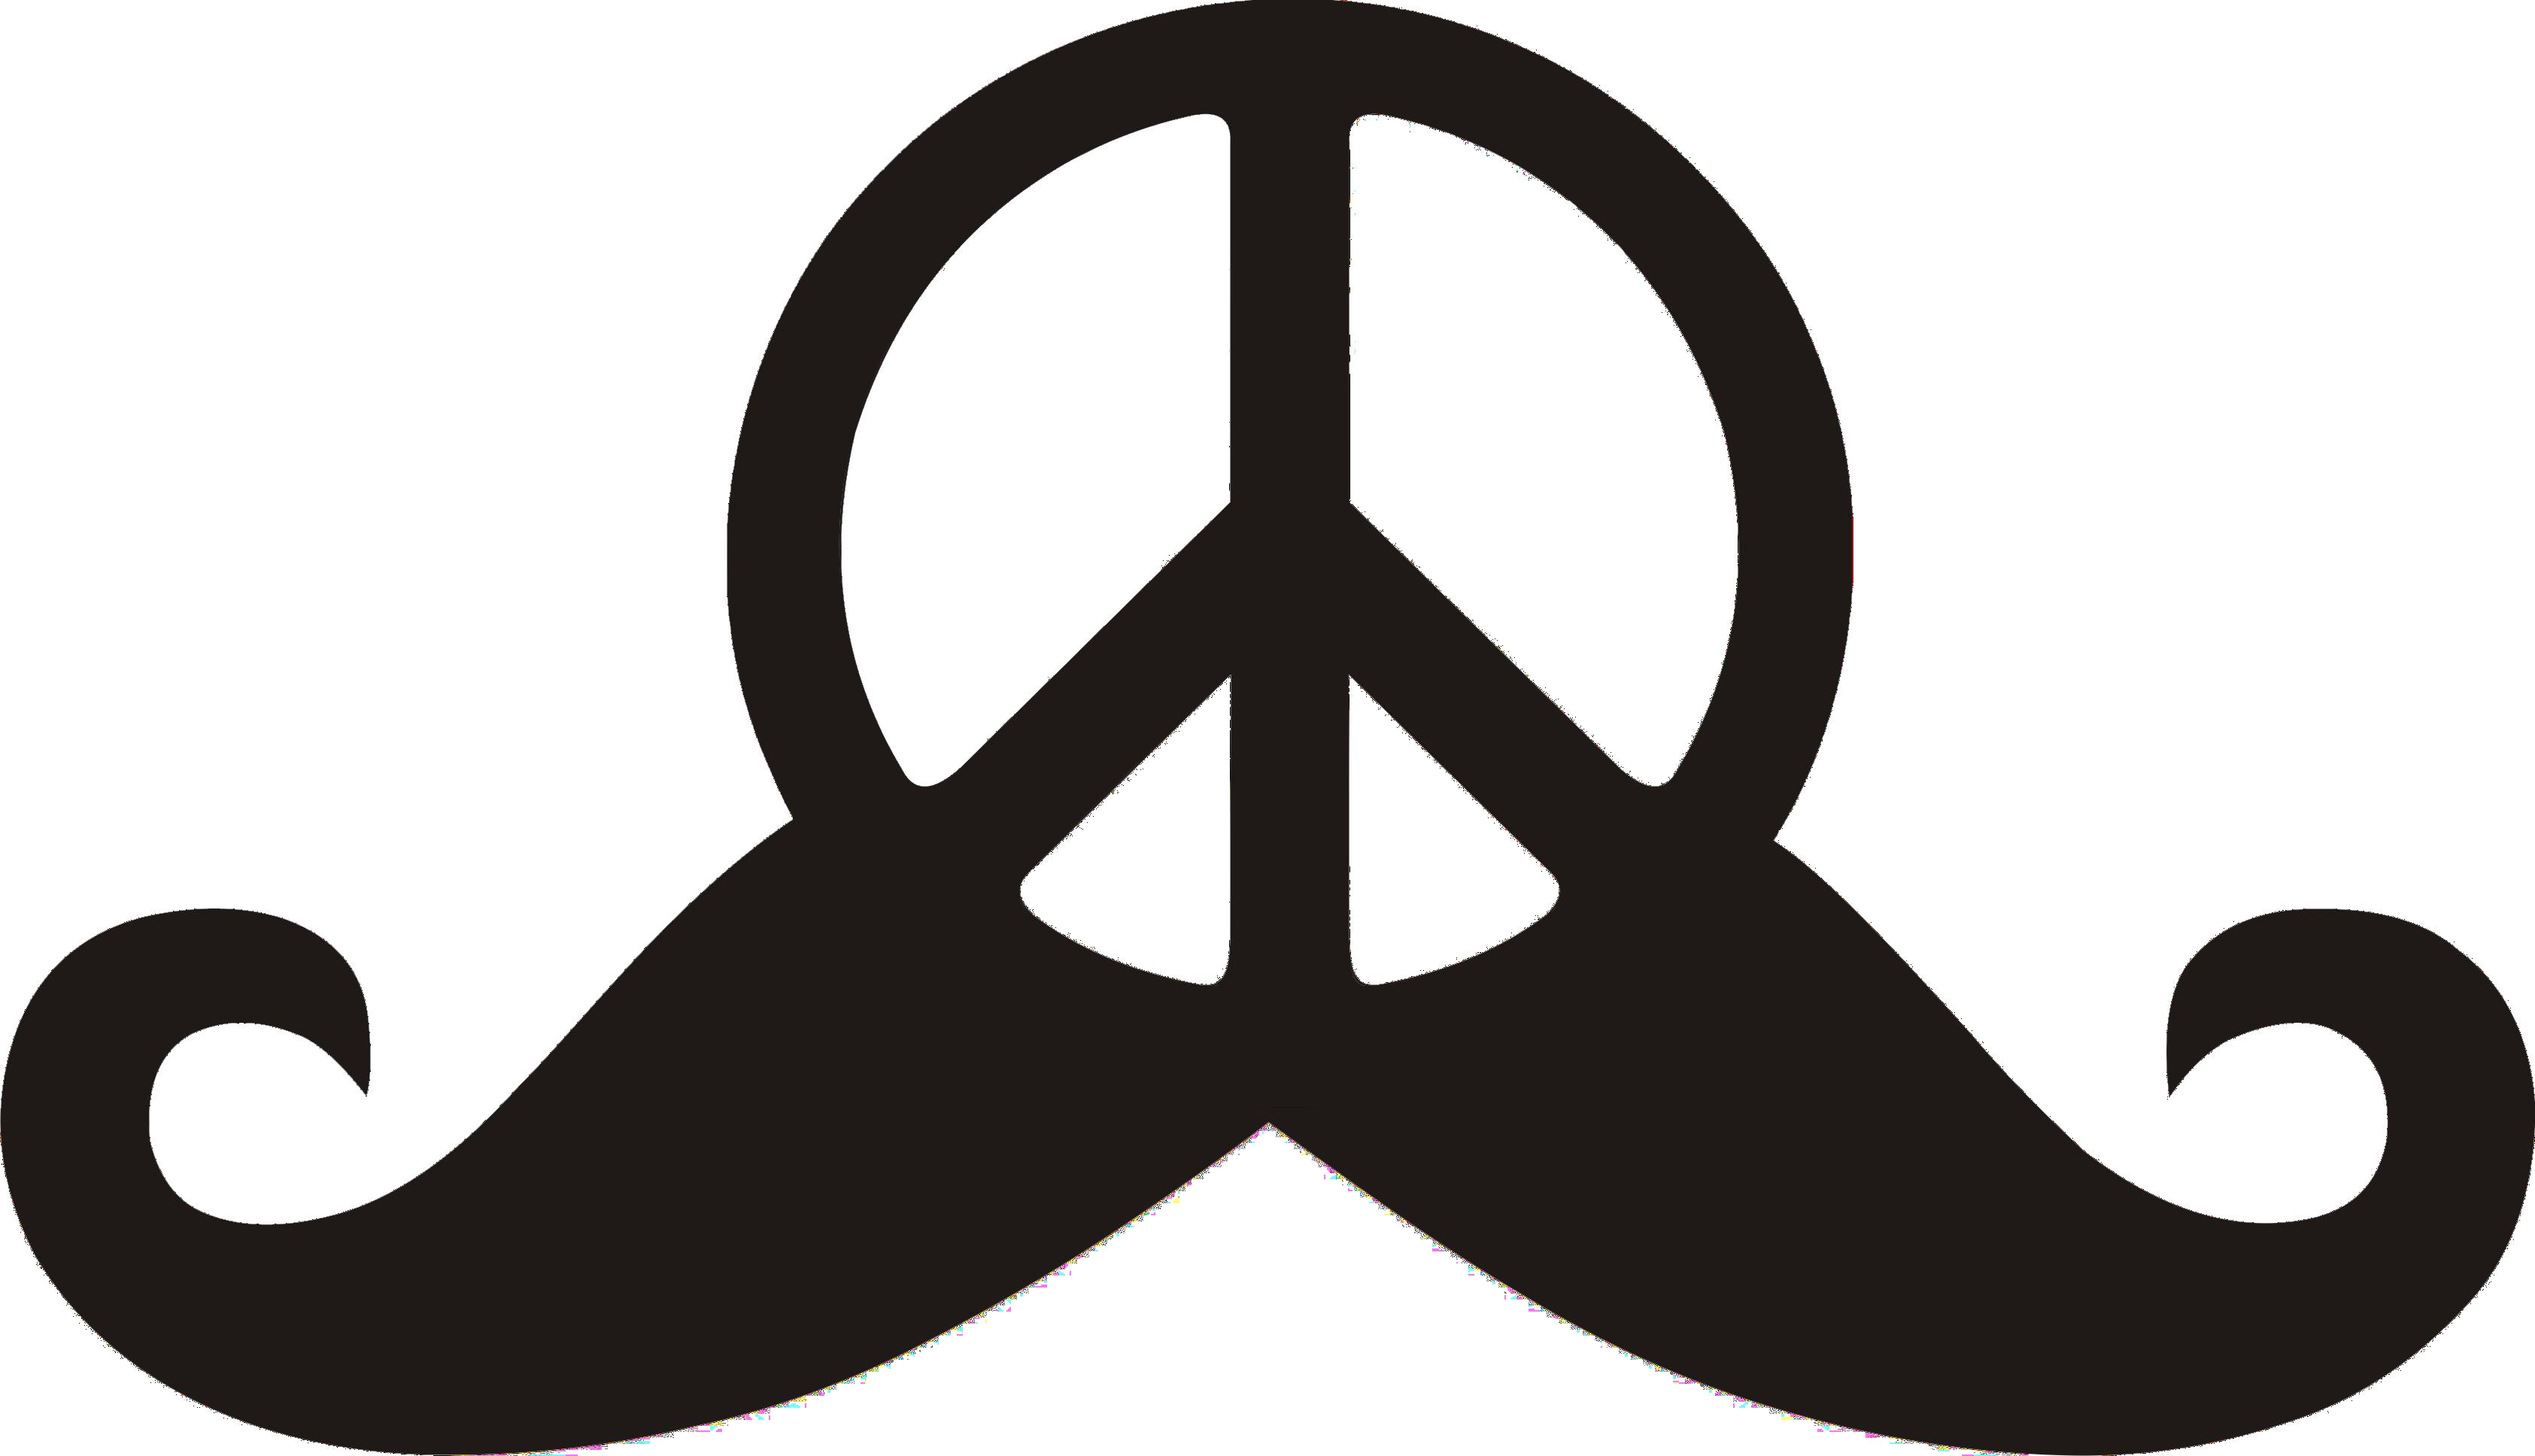 Peacetache